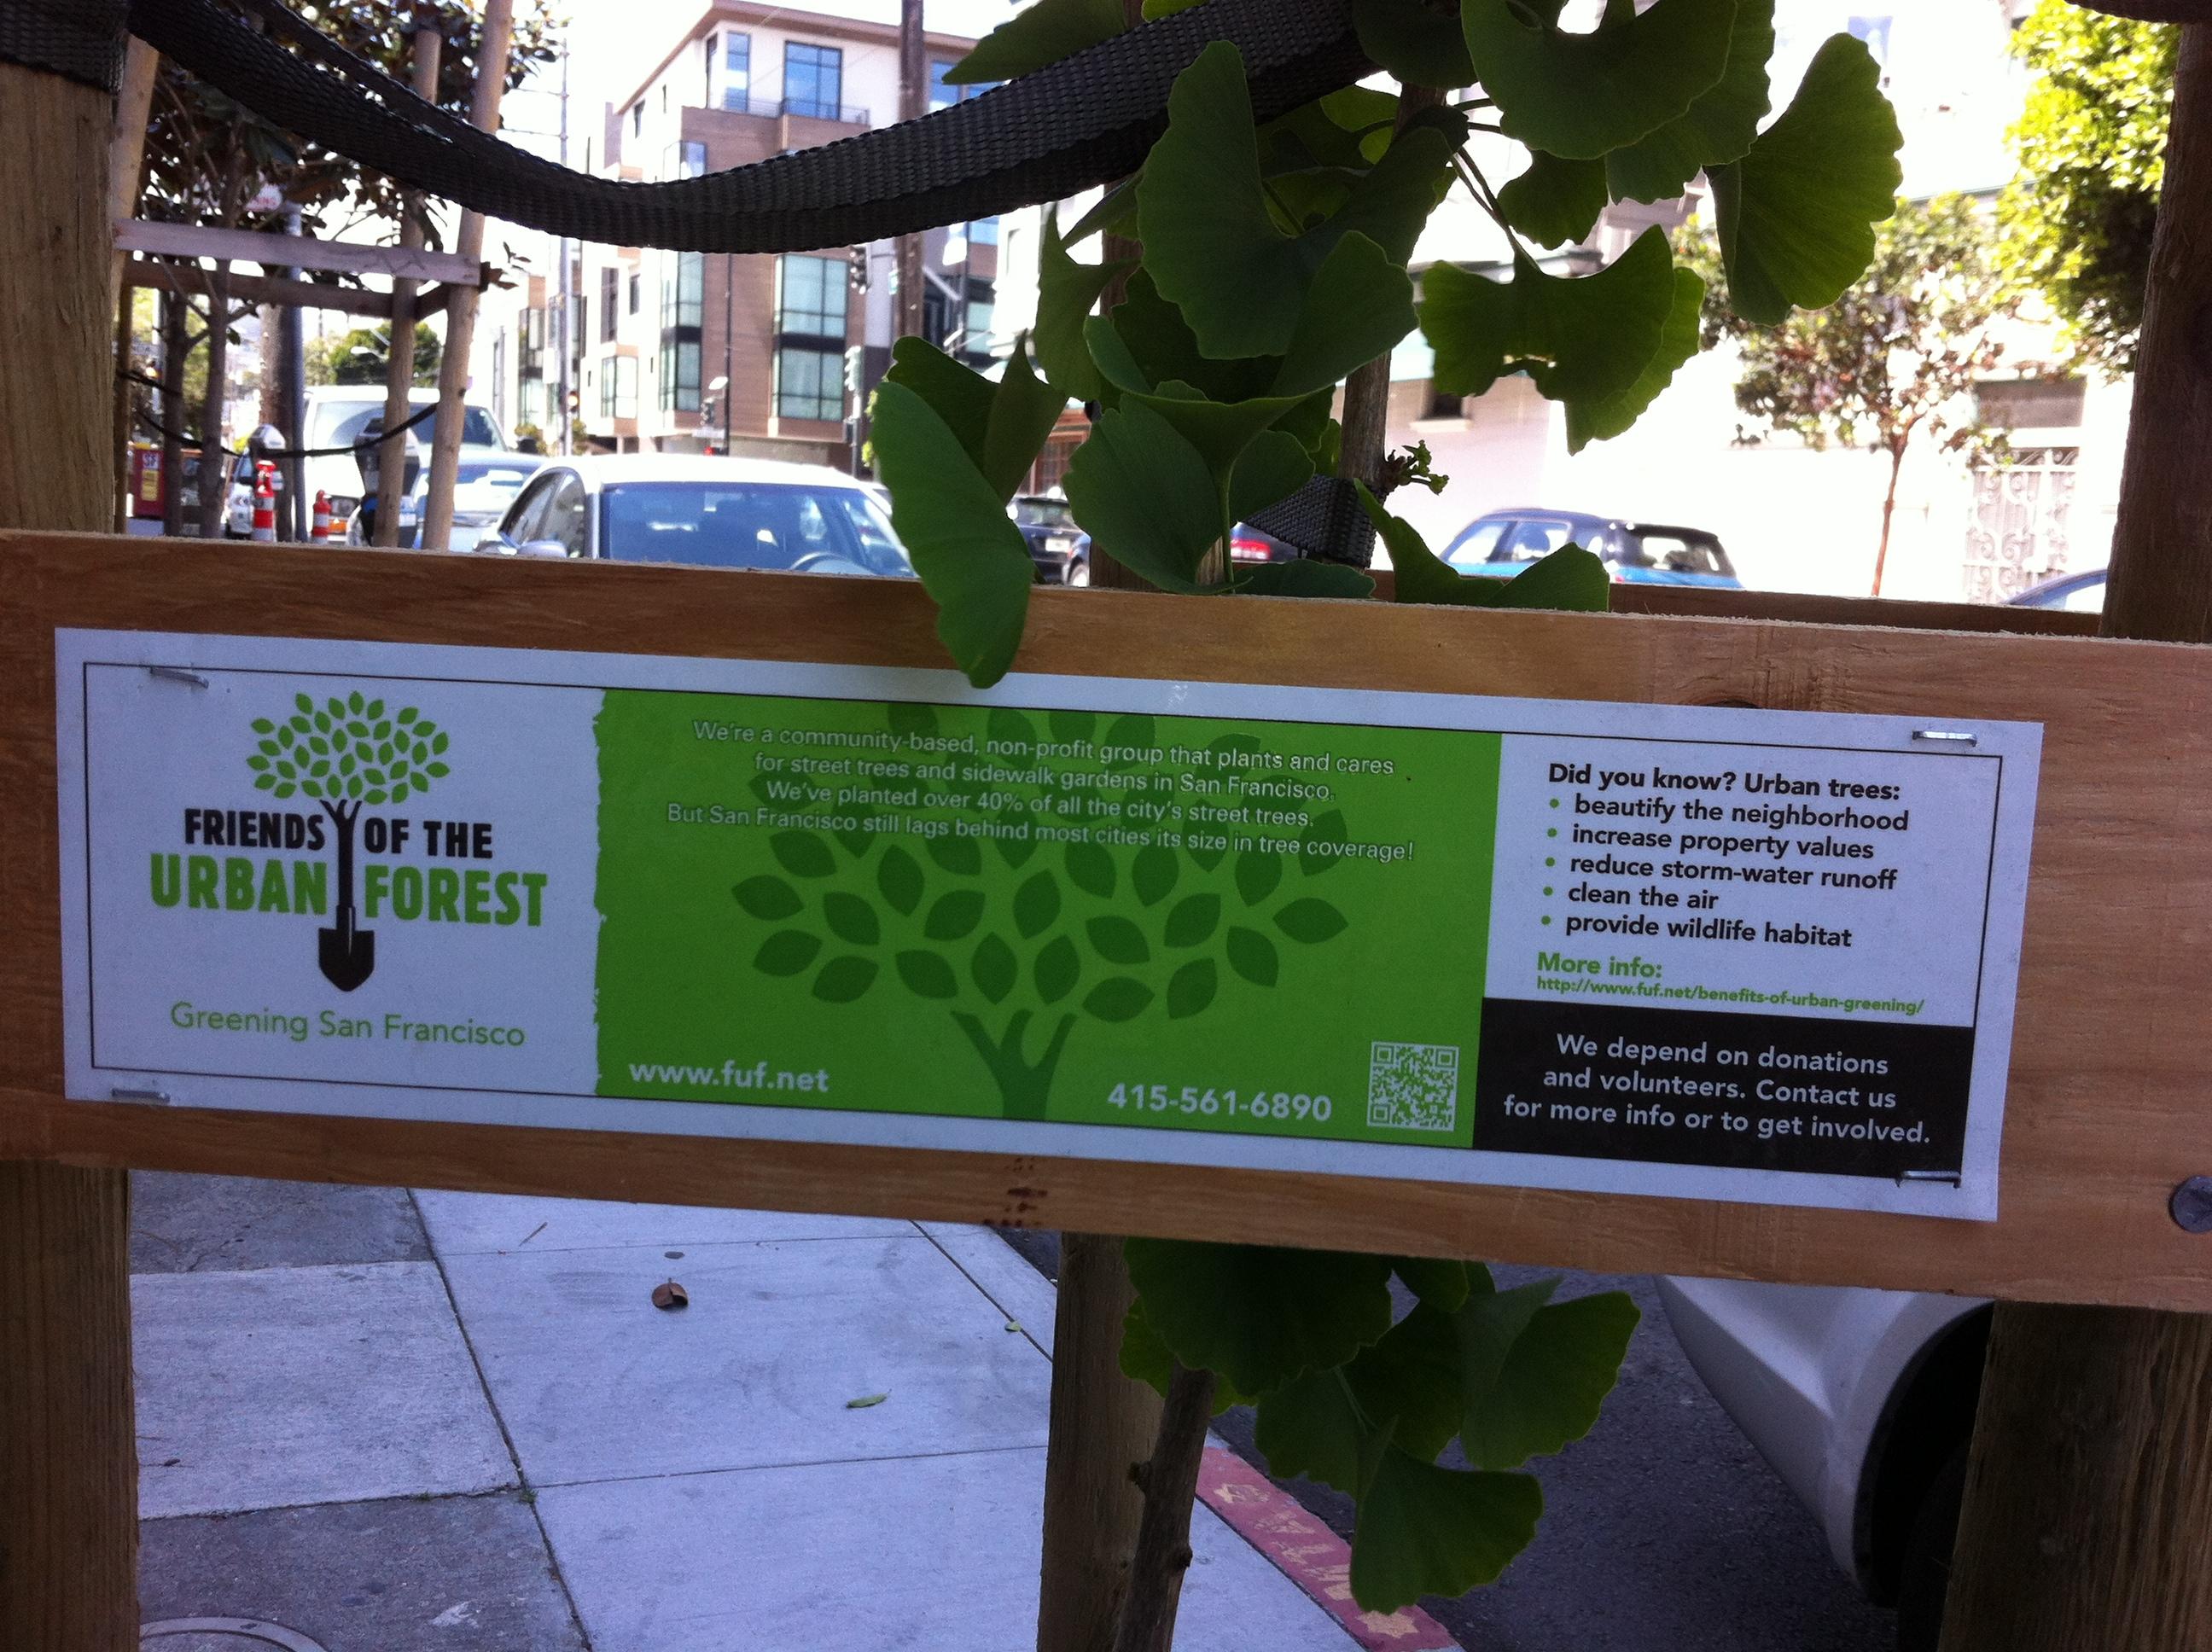 Greening San Francisco